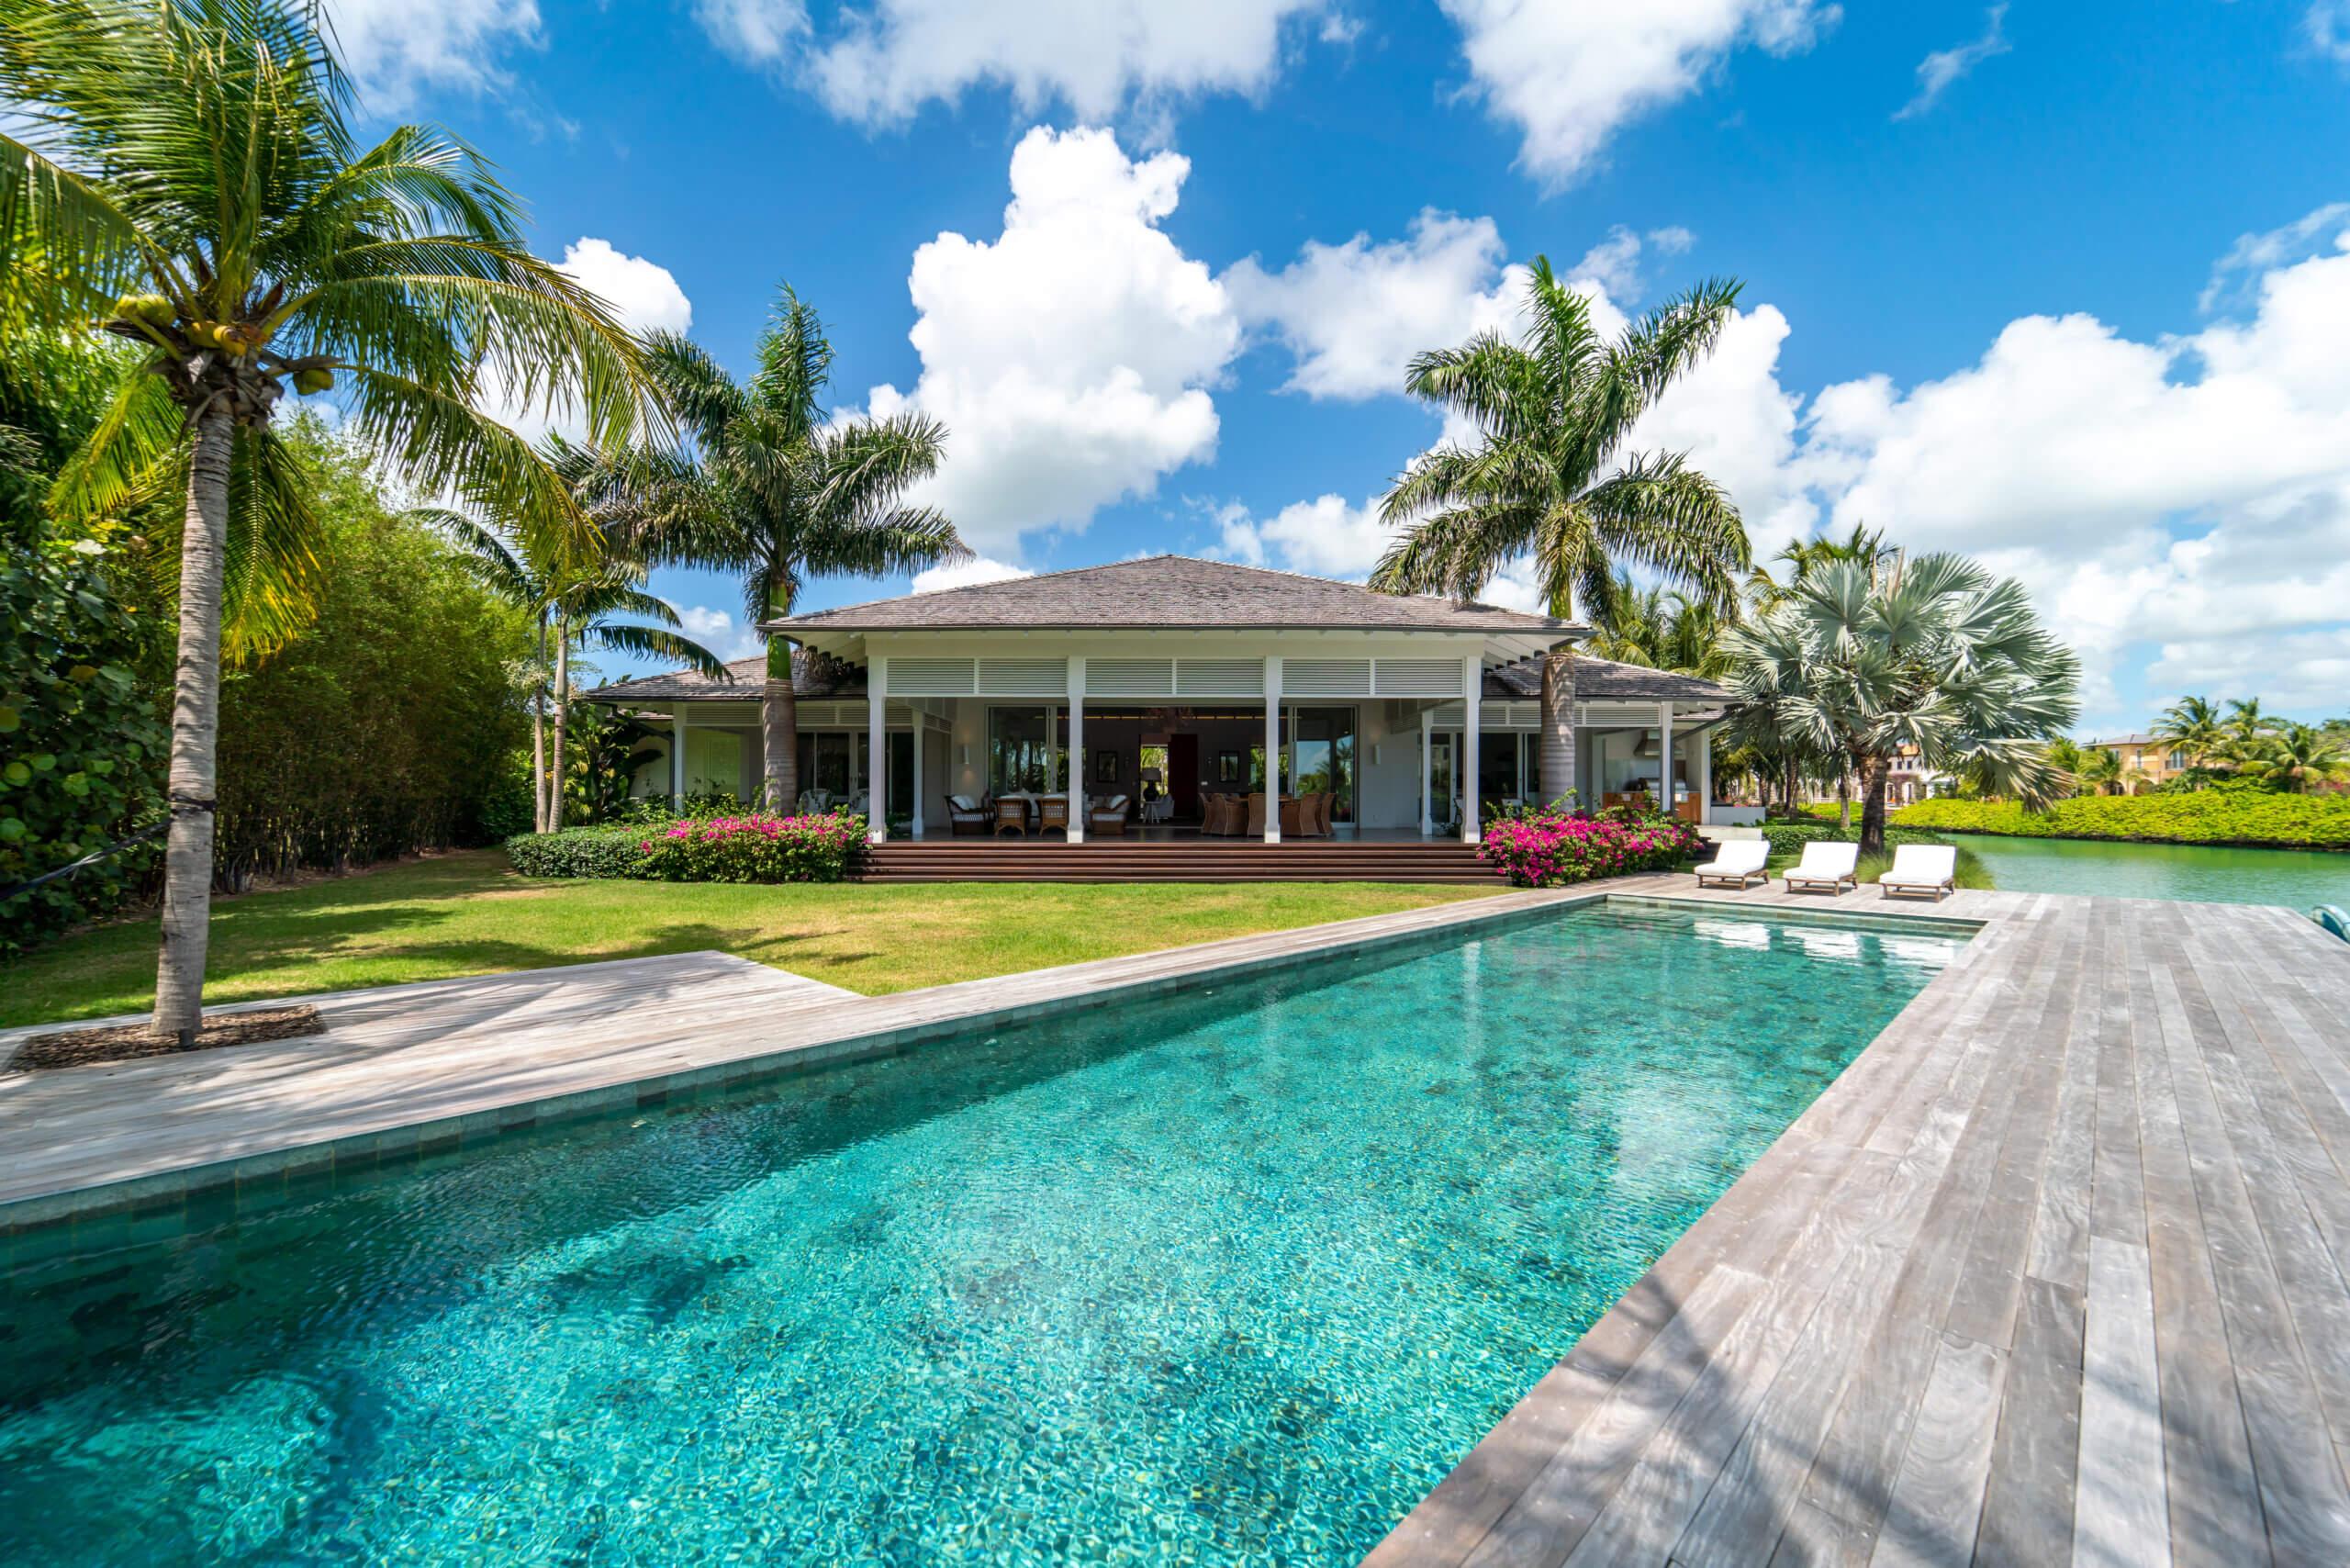 Condo Vikings and Jolie Luxury Homes